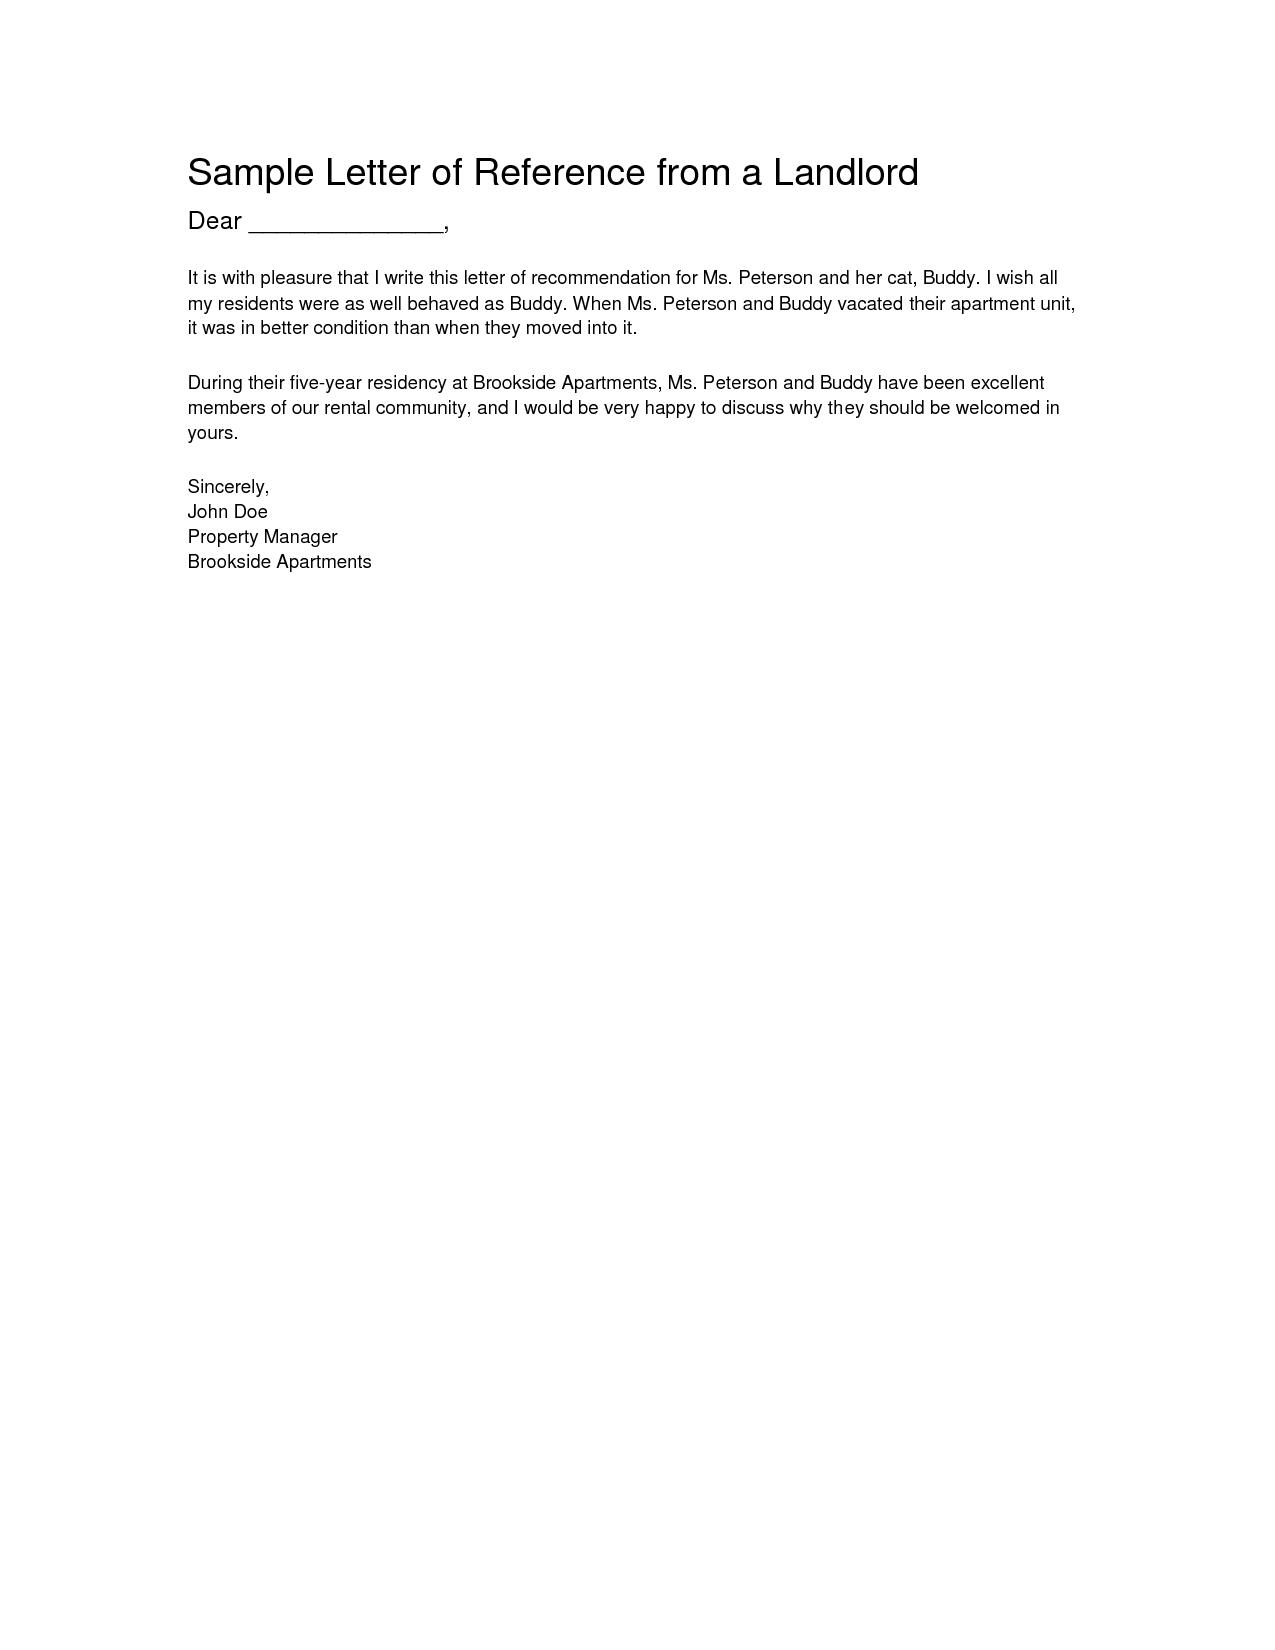 Rental Reference Letter Template - Letter Re Mendation From Landlord Letter Of Re Mendation